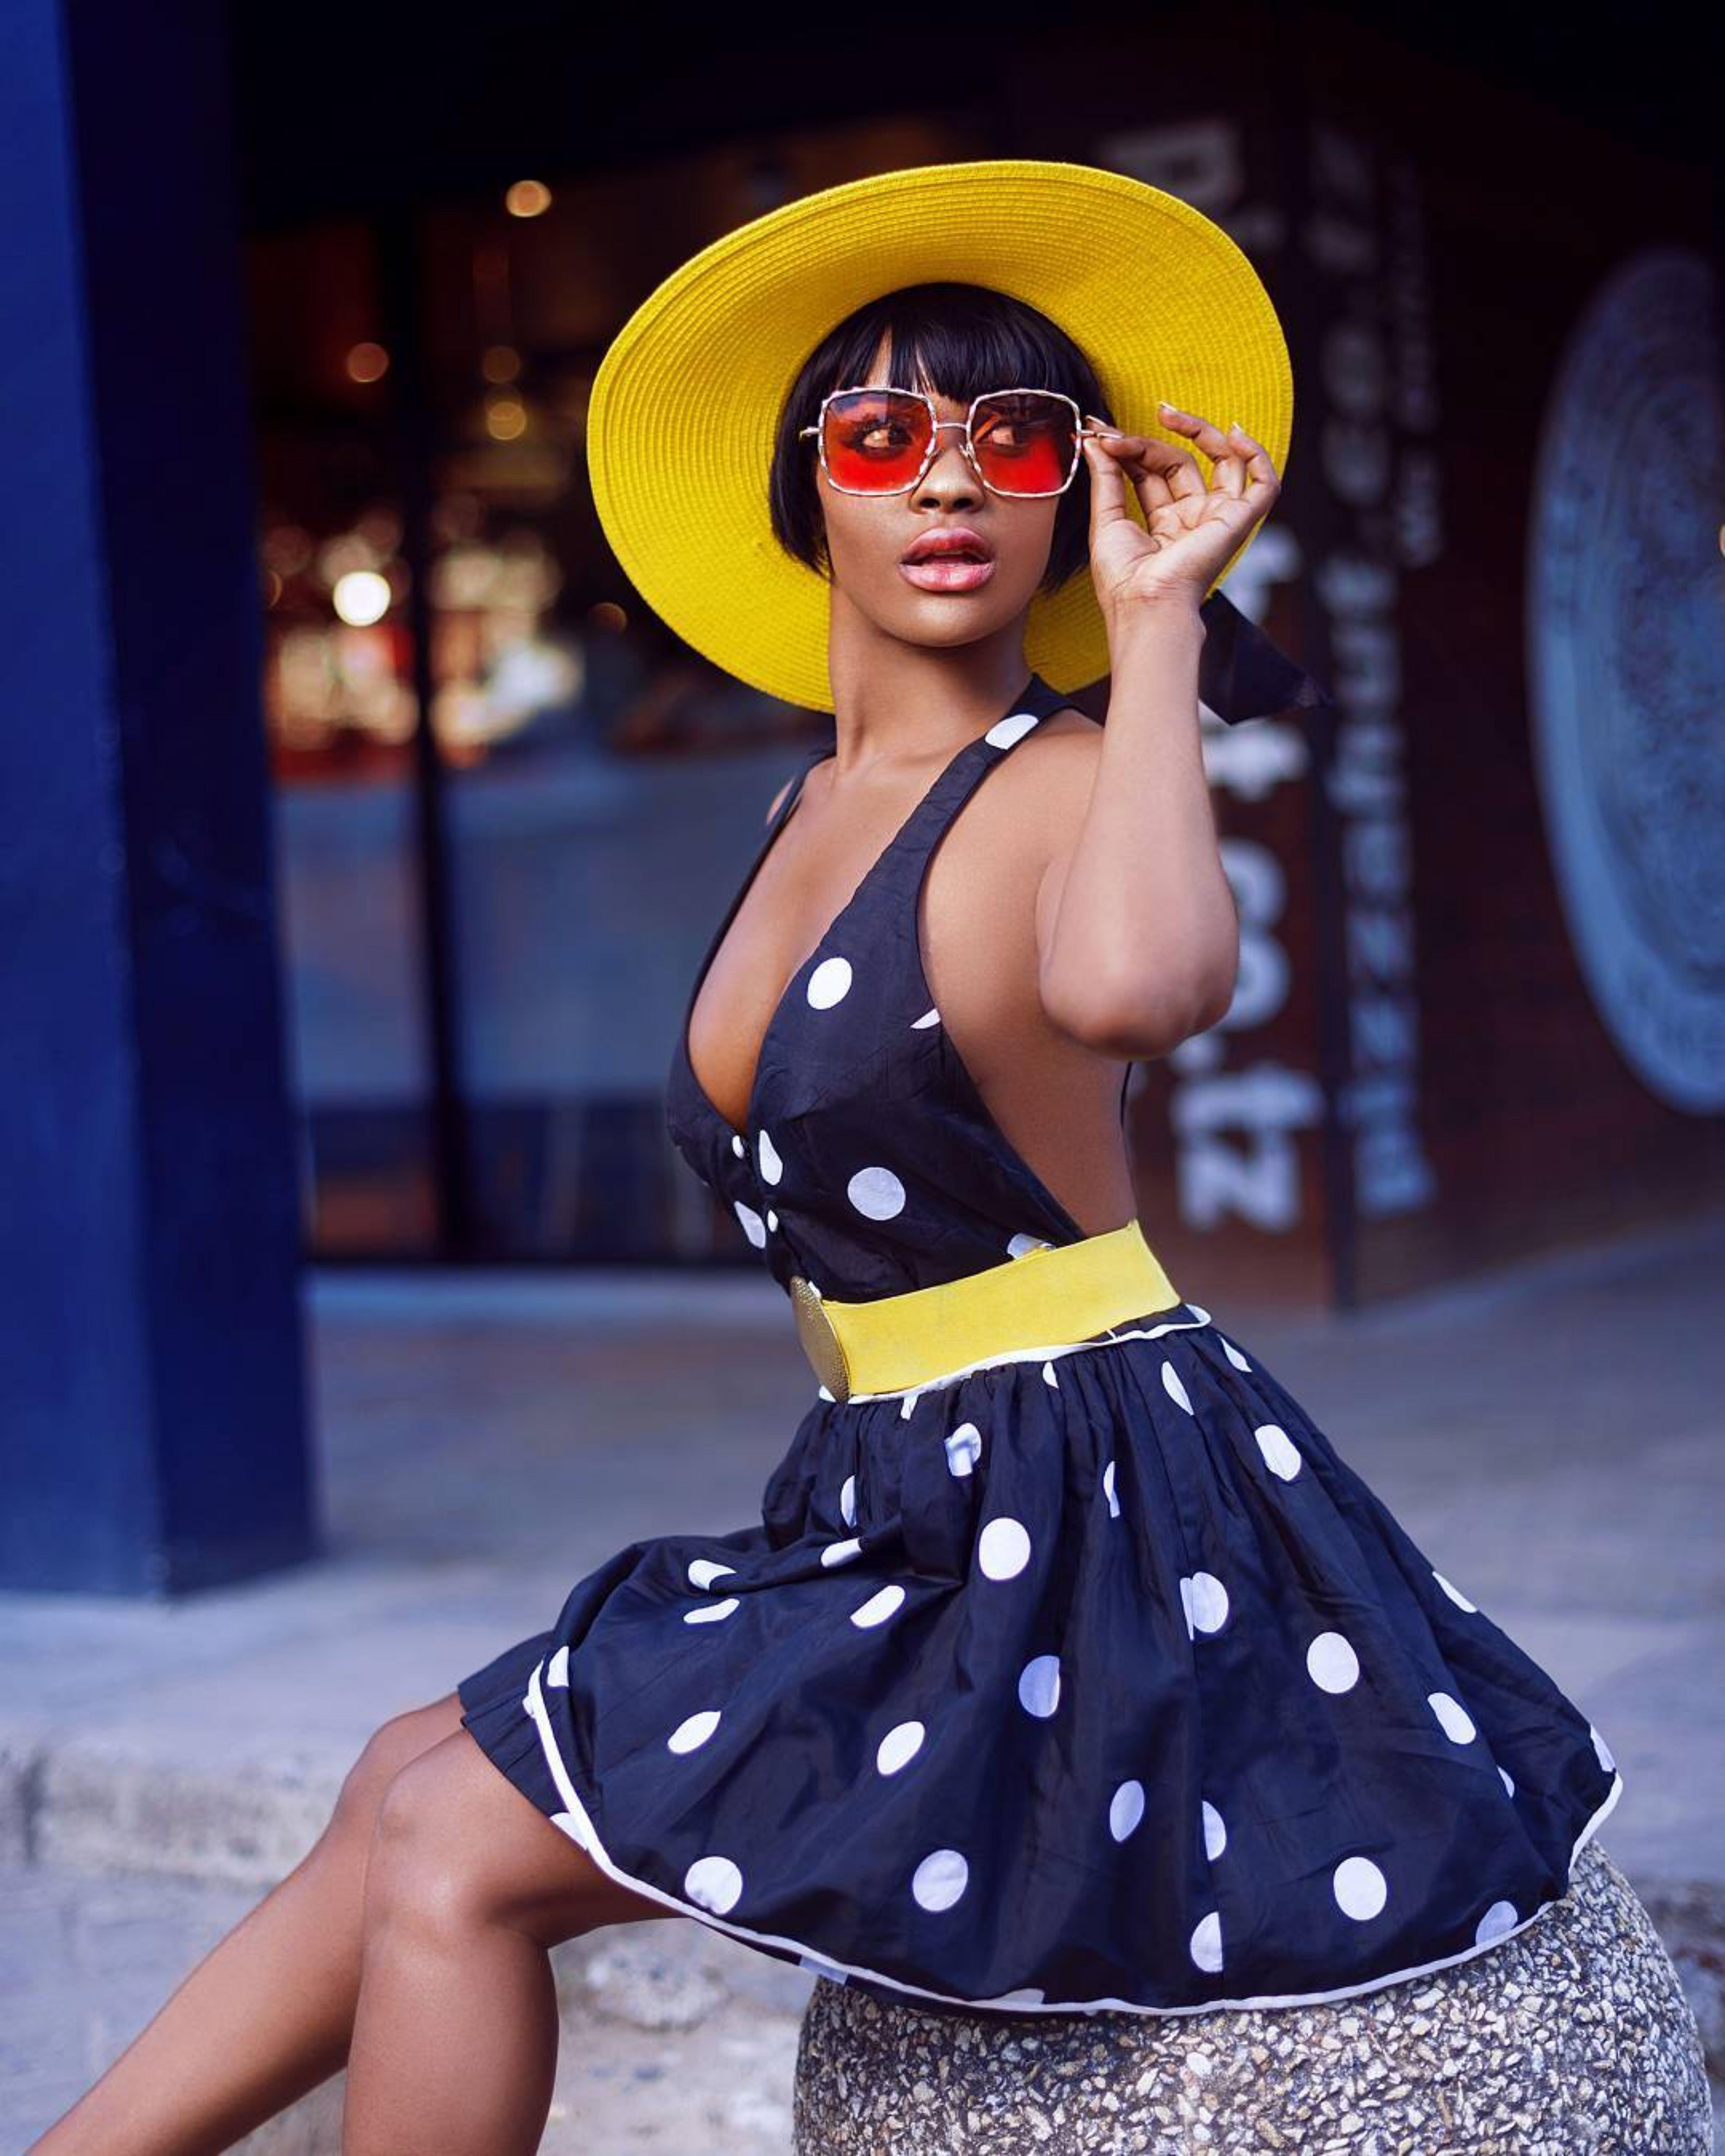 Photo Of Woman Wearing Polka Dots Dress